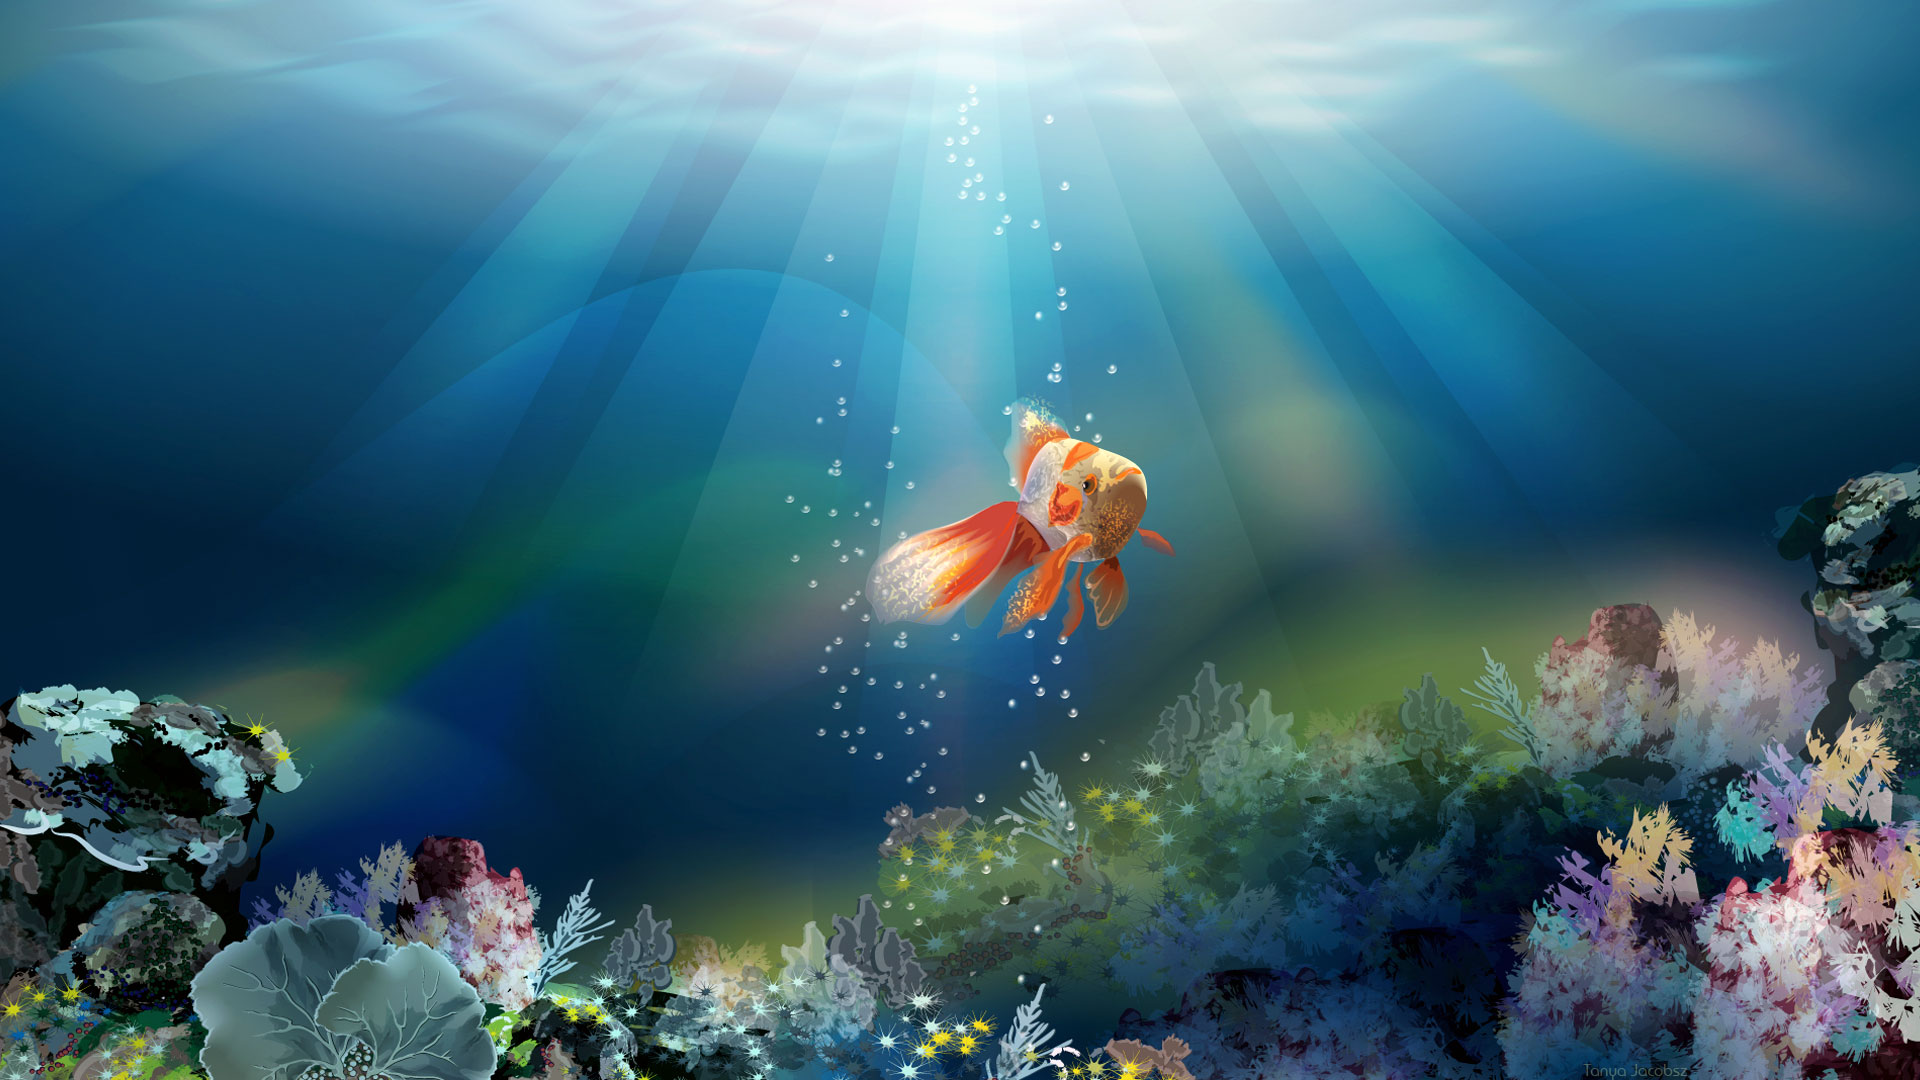 Fish Wallpaper HD Free Download